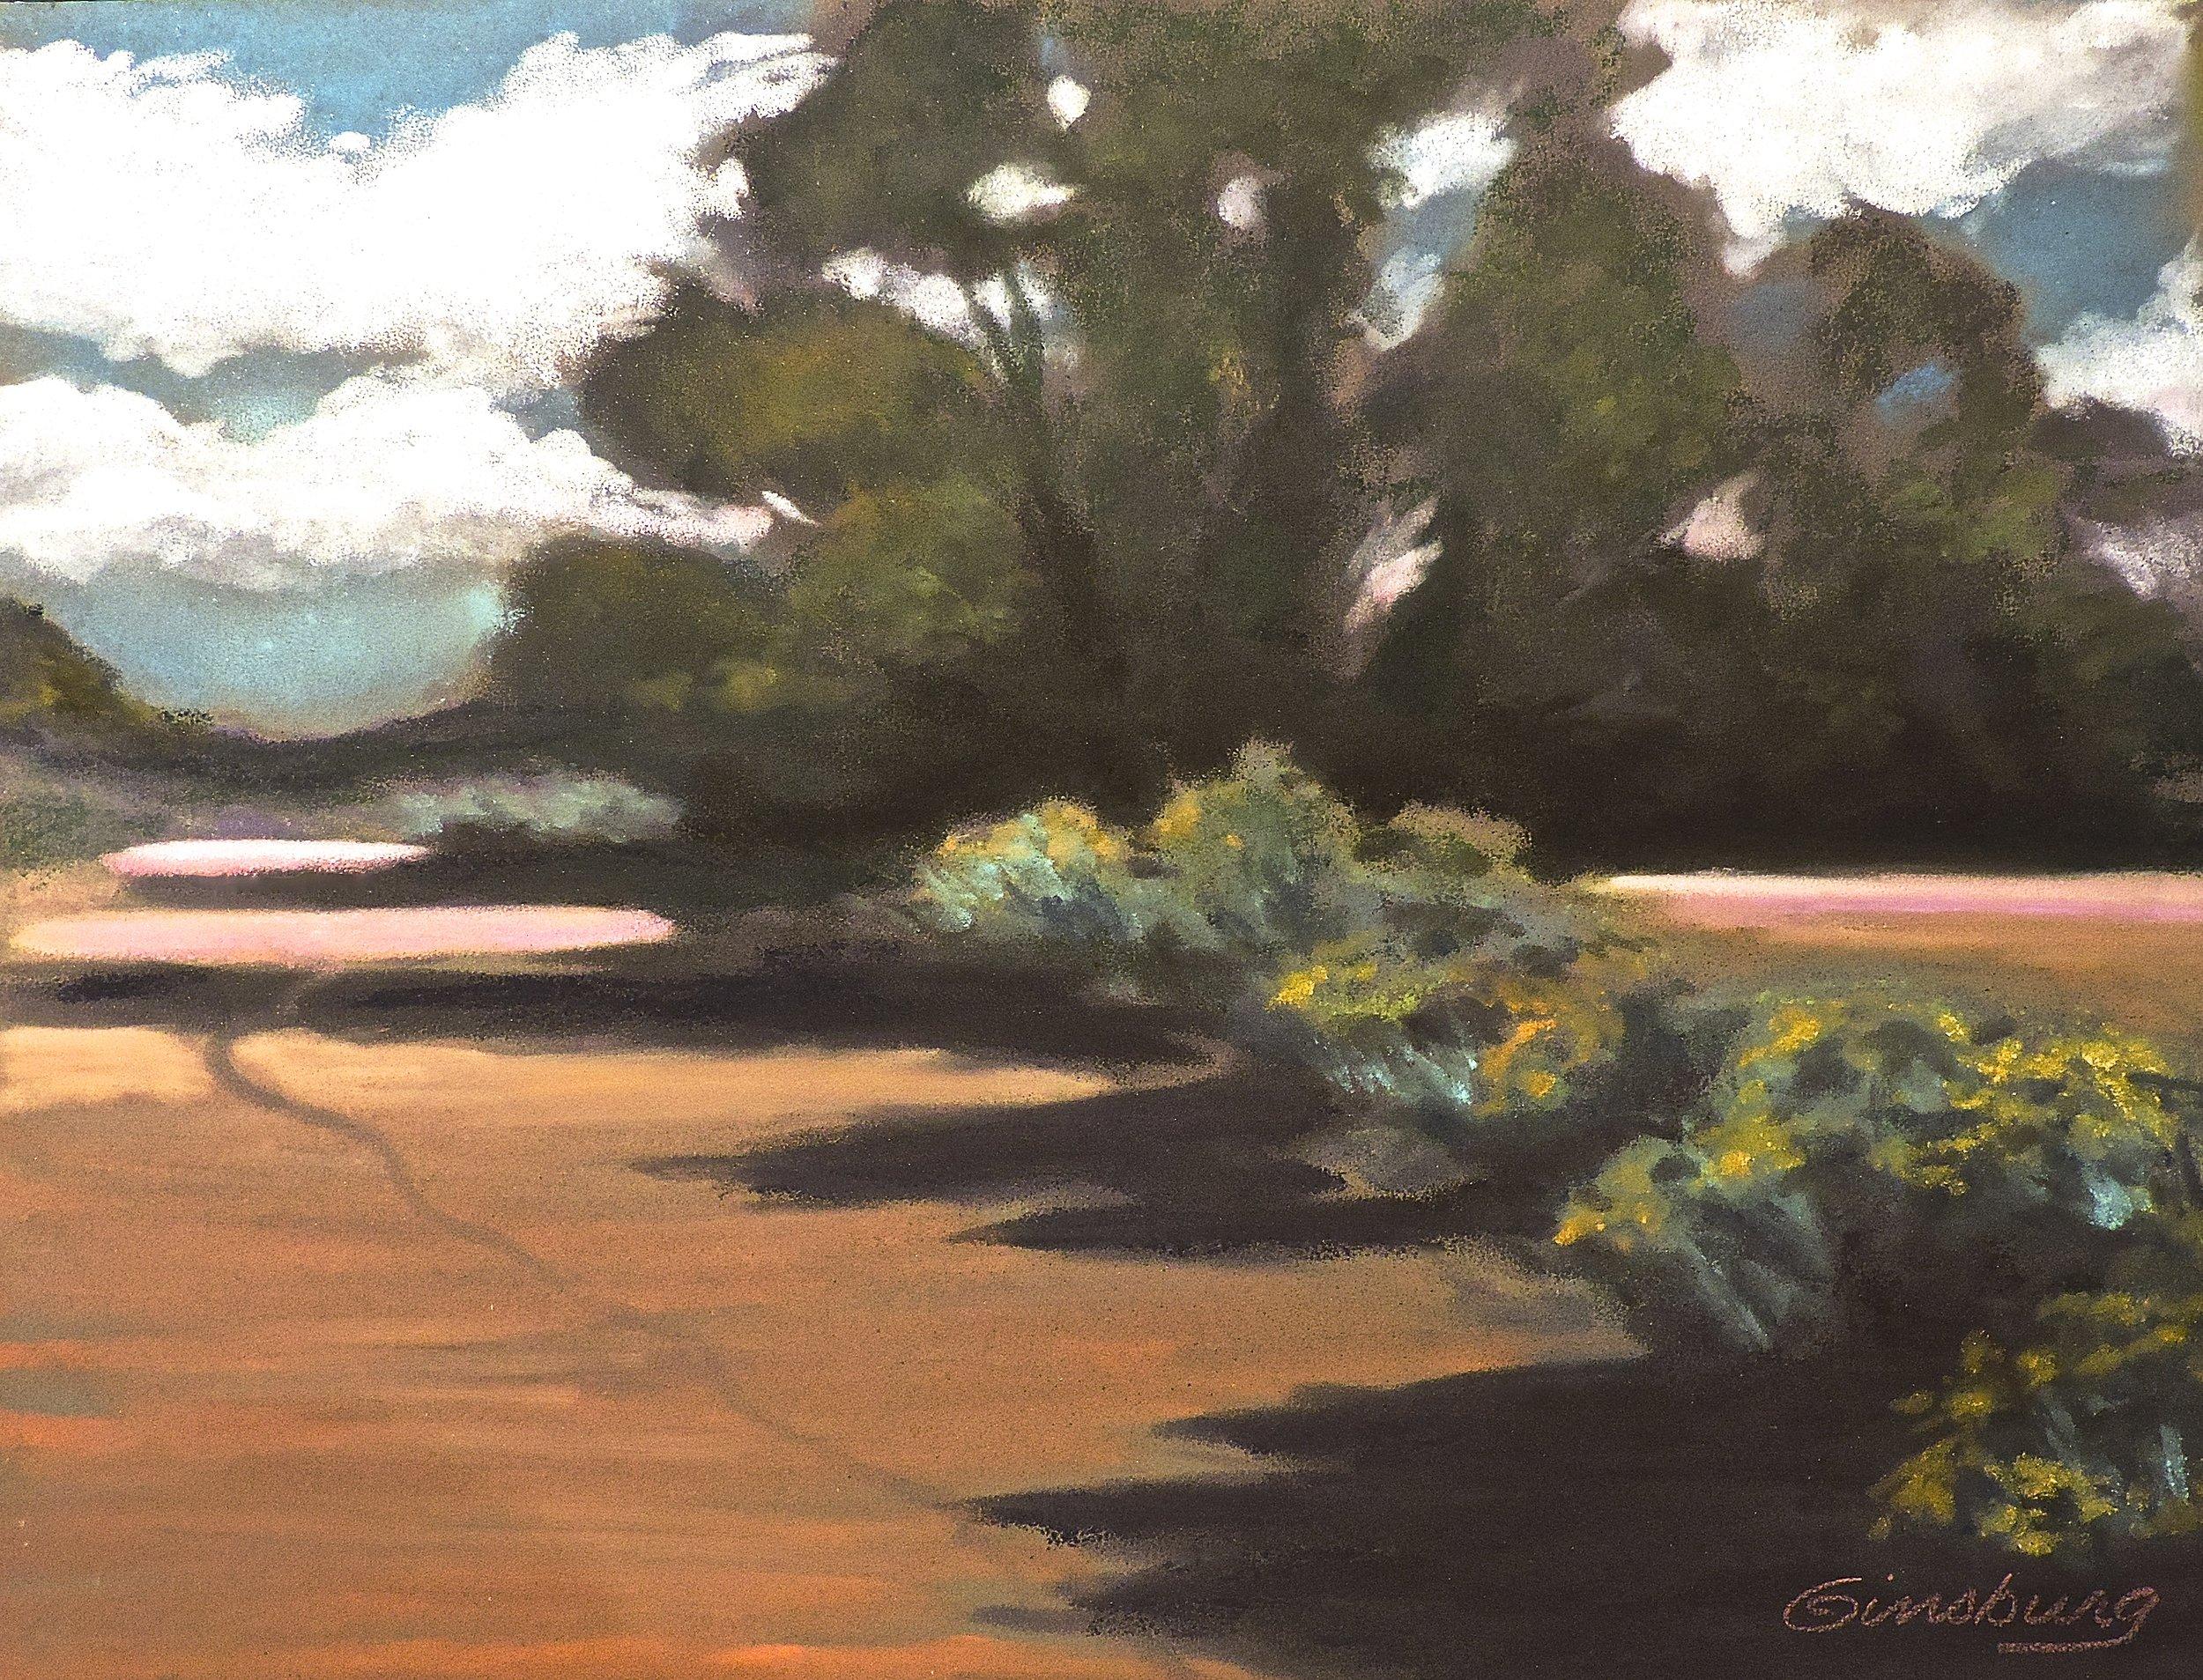 """SHADOWS OF THE ARROYO"", Mission Hill, Santa Fe, NEW MEXICO  Pan Pastel® Cheri GInsburg ©"